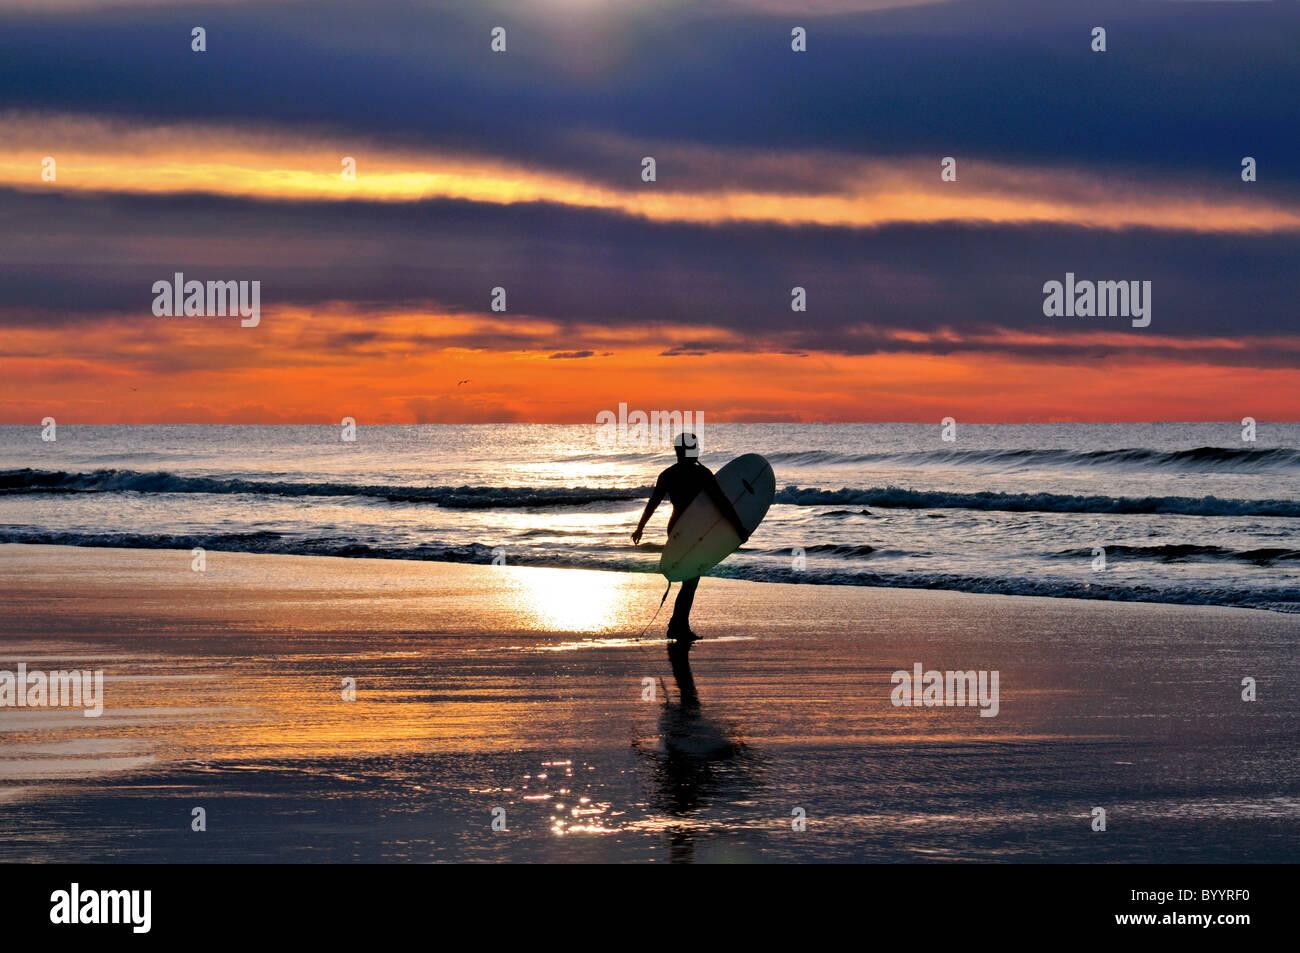 Portugal, Algarve: surfista en la playa Praia do Amado Foto de stock